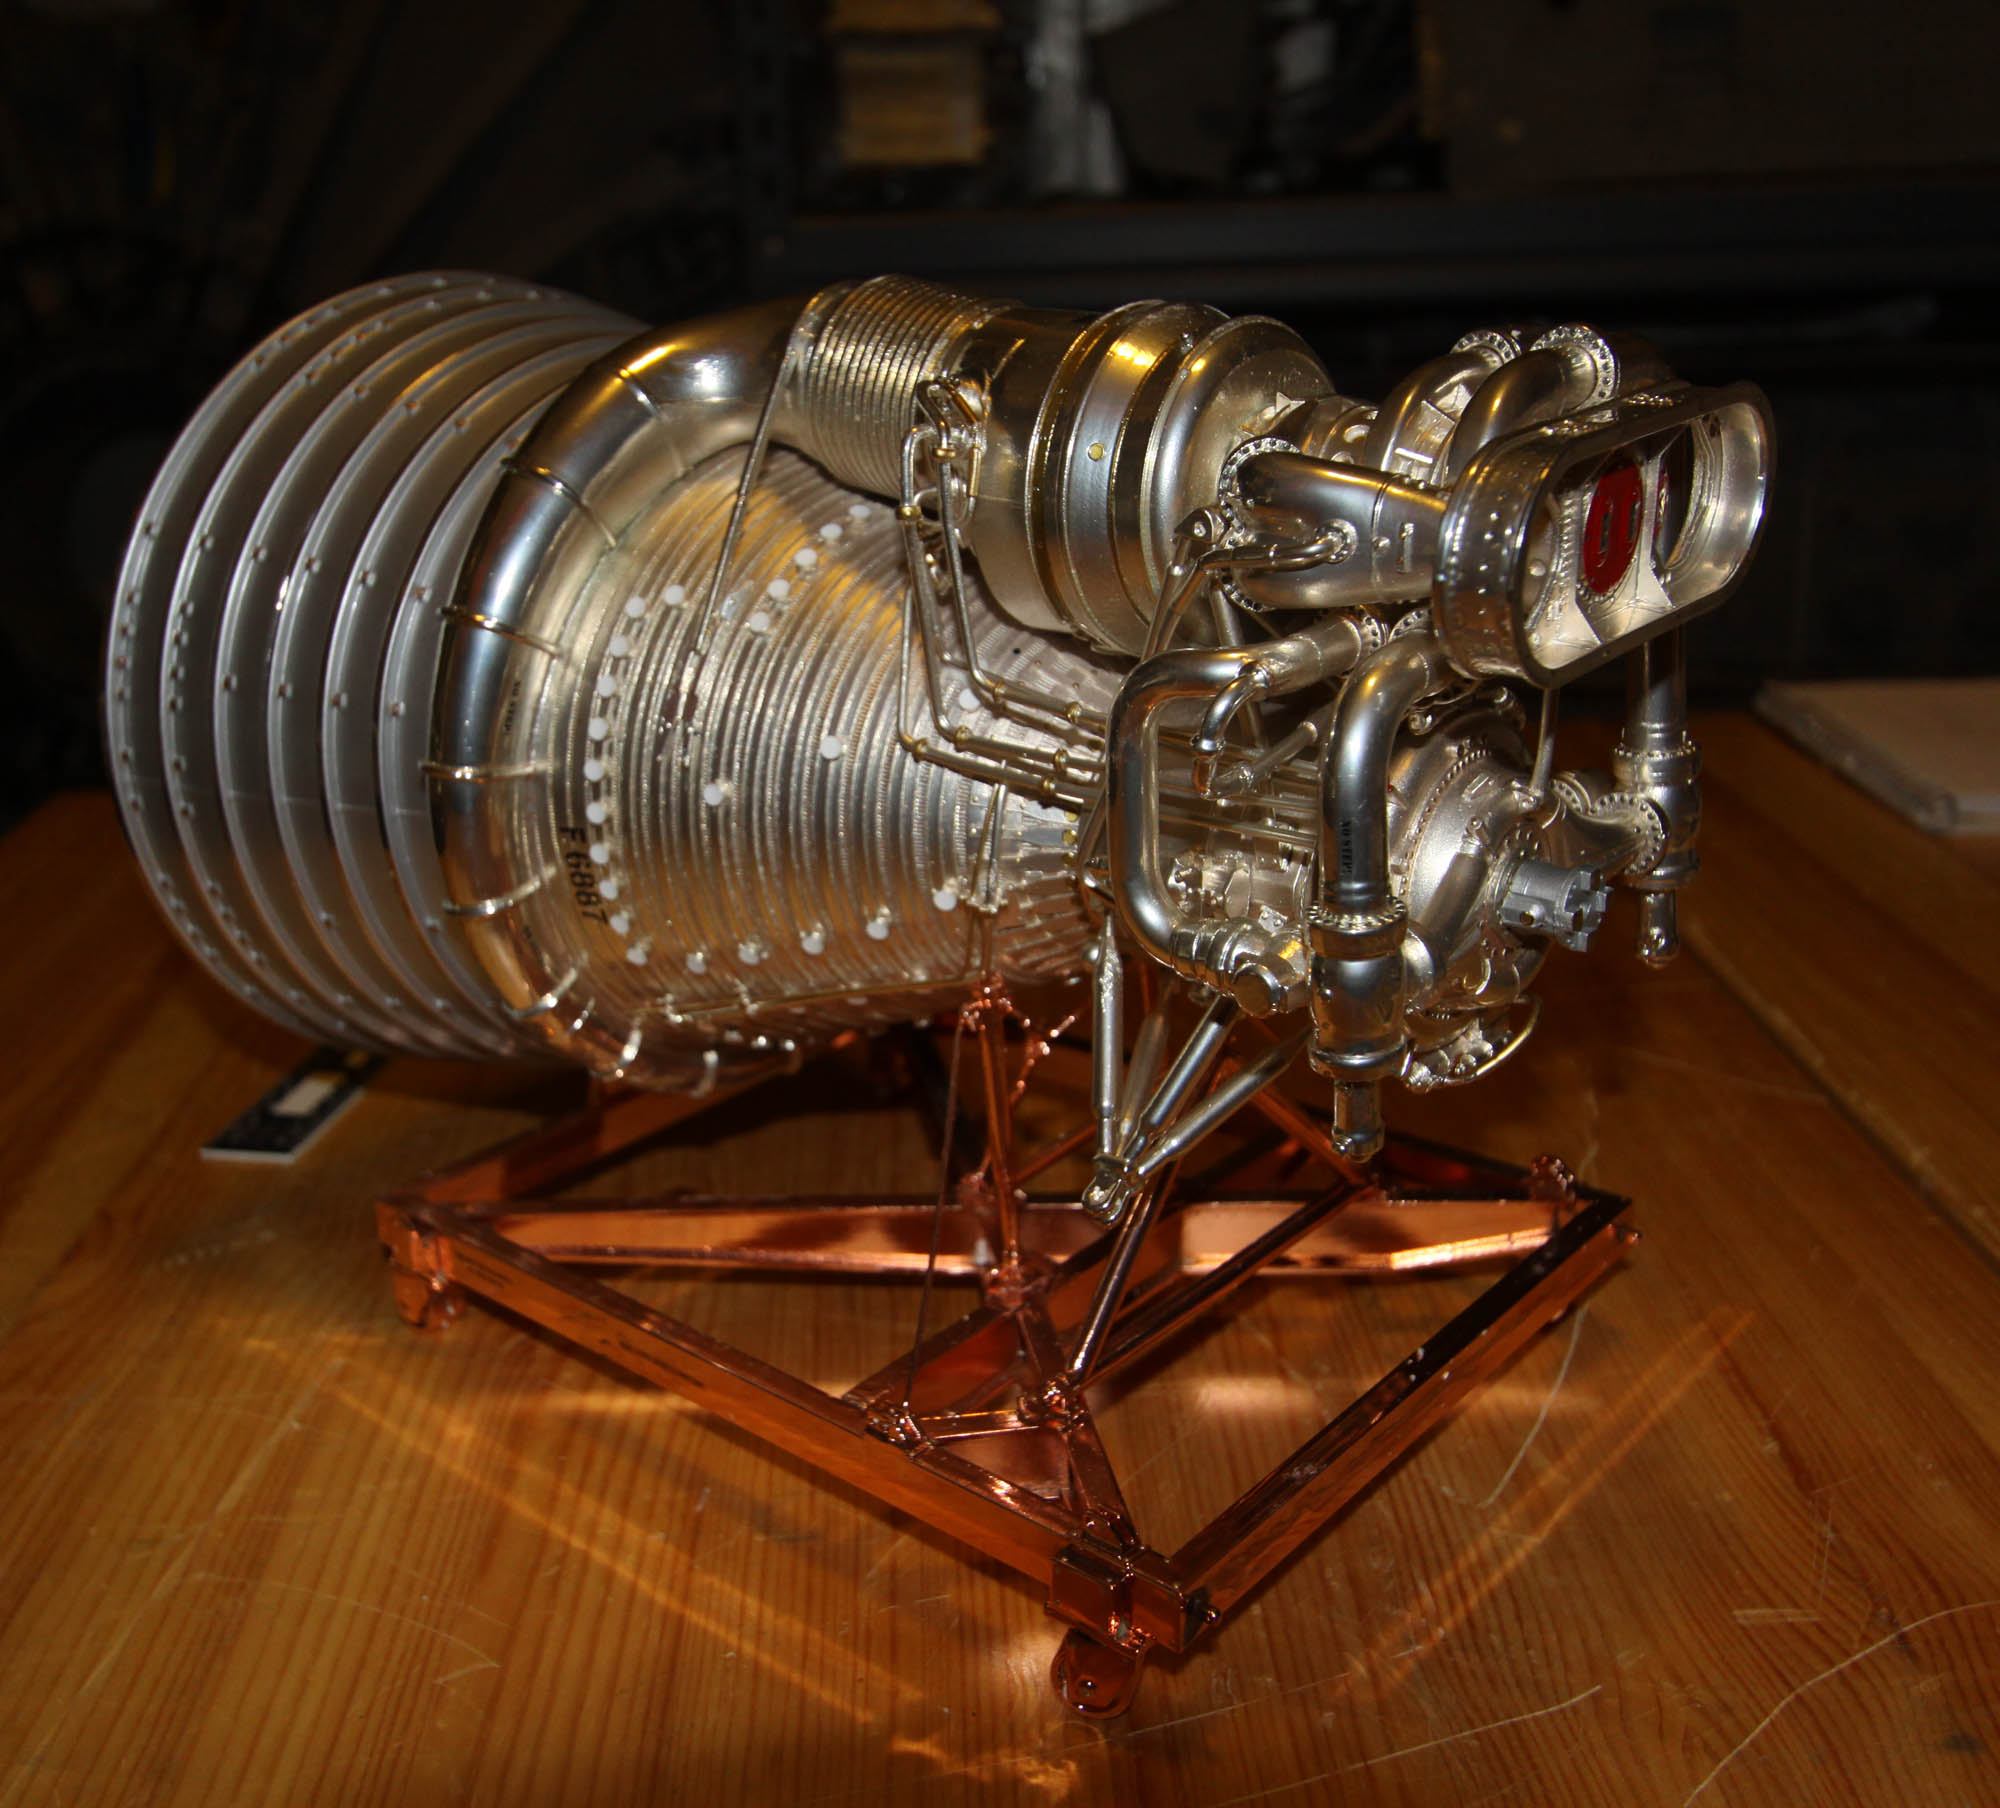 Accurate Models 1 20 Rocketdyne F-1 Engine